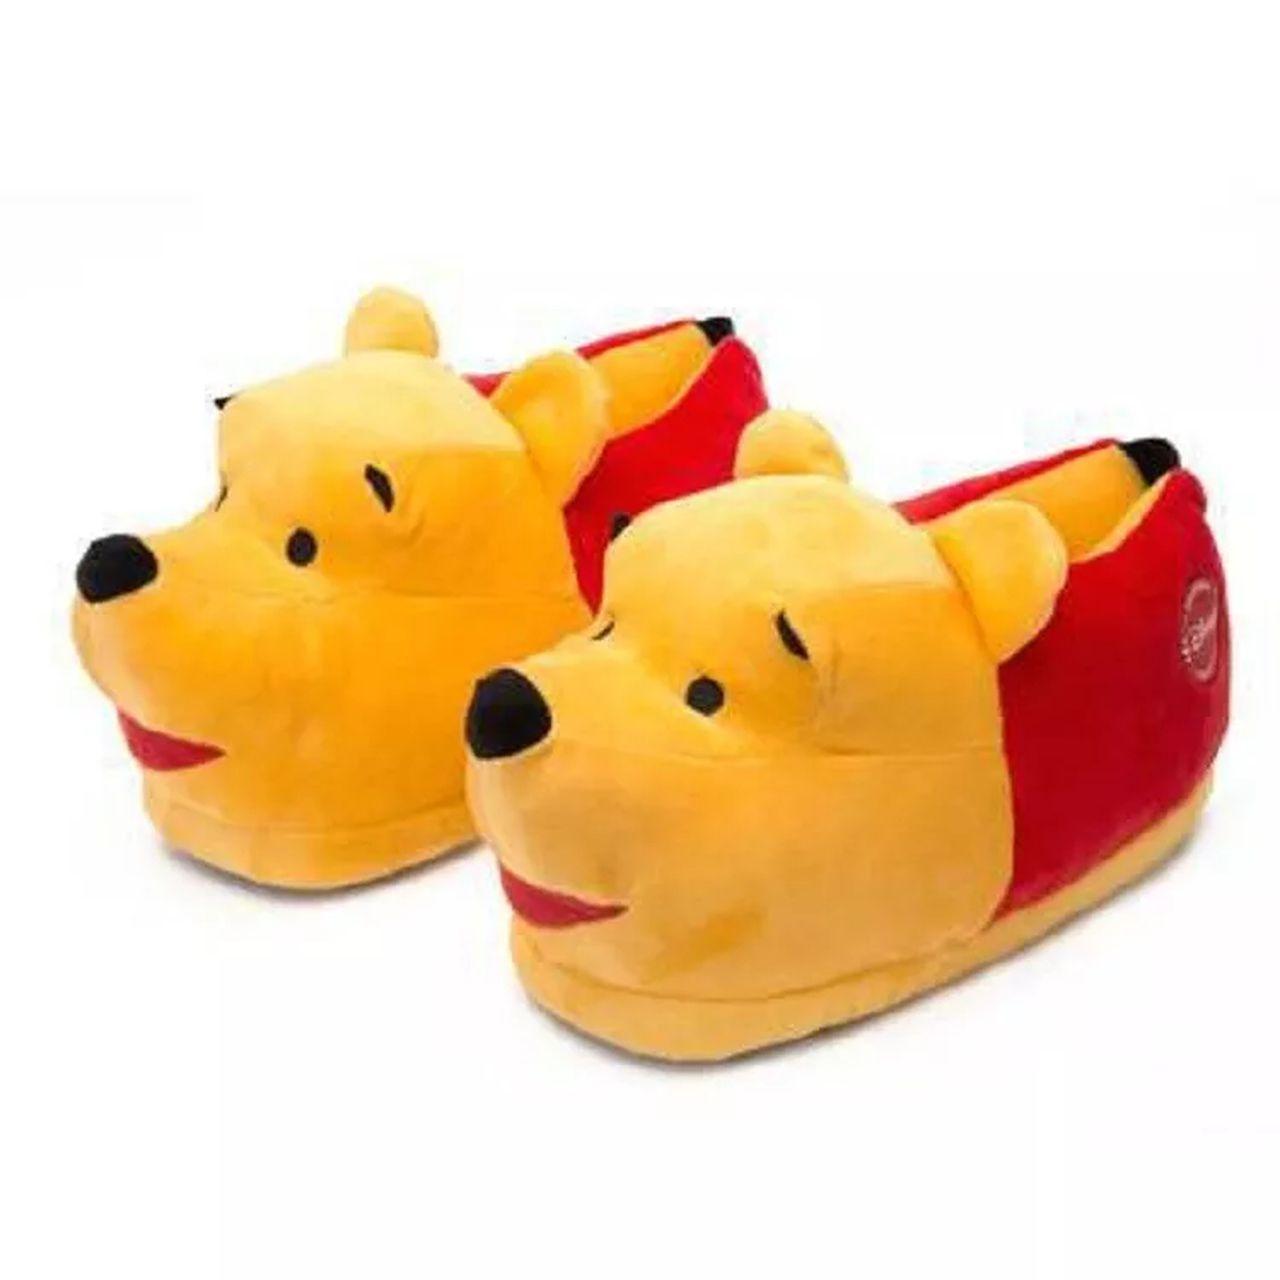 1cbb2c86dc1f52 Pantufa Ursinho Pooh 3D - Ricsen Disney - Anti Derrapante